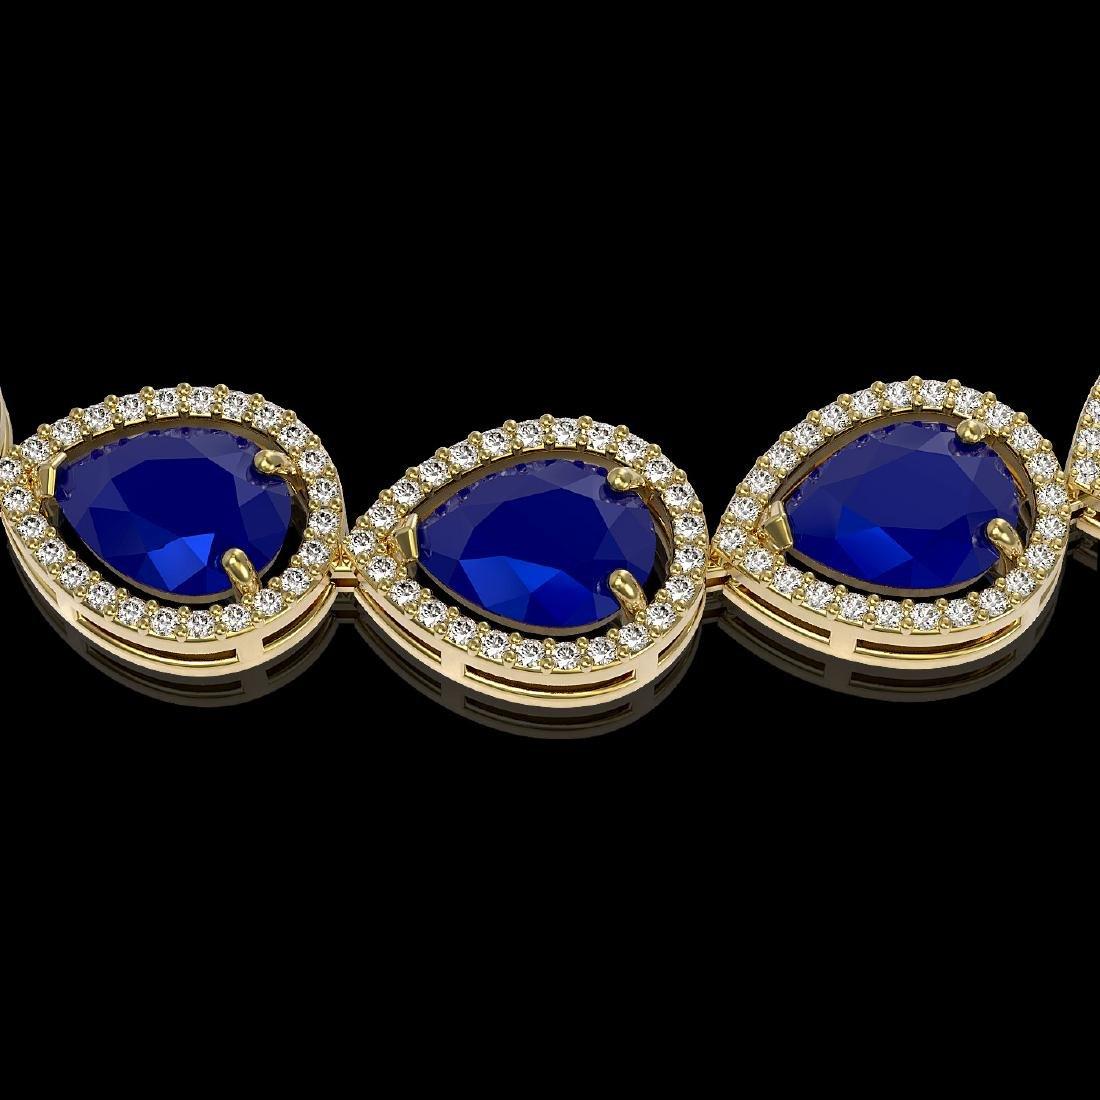 64.01 CTW Sapphire & Diamond Halo Necklace 10K Yellow - 3